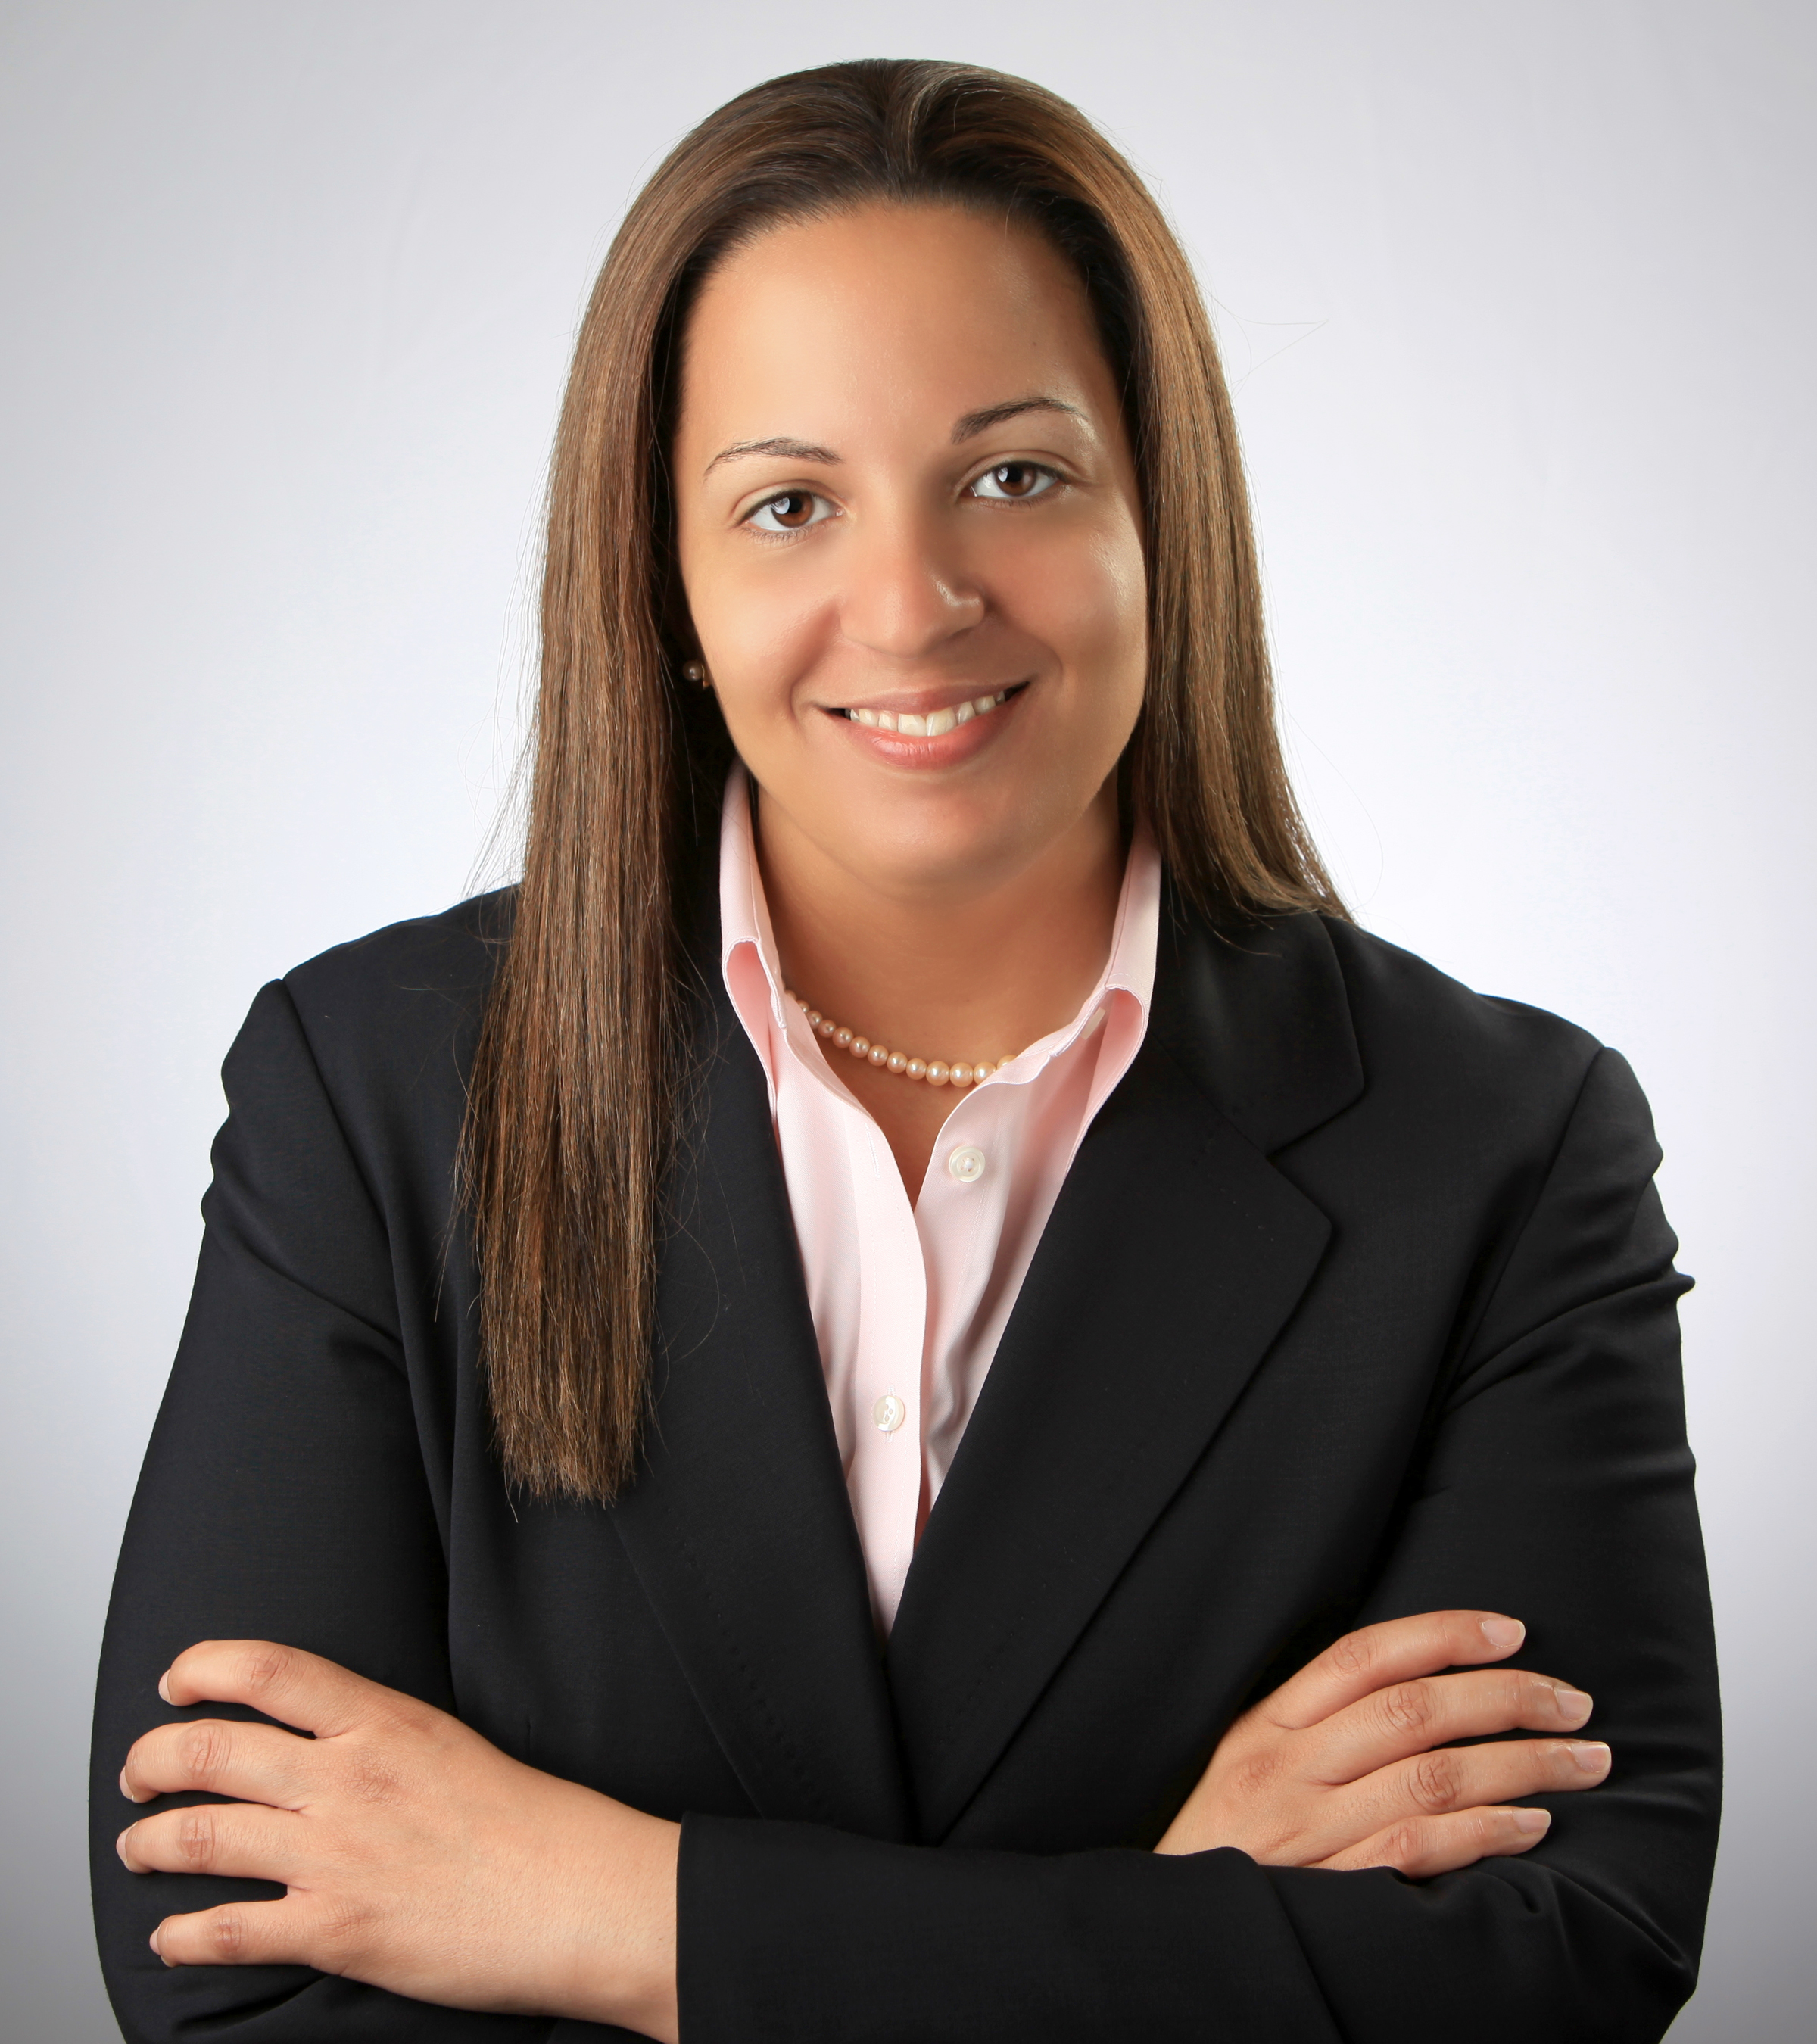 Melissa Thornton, LSW Limo CEO